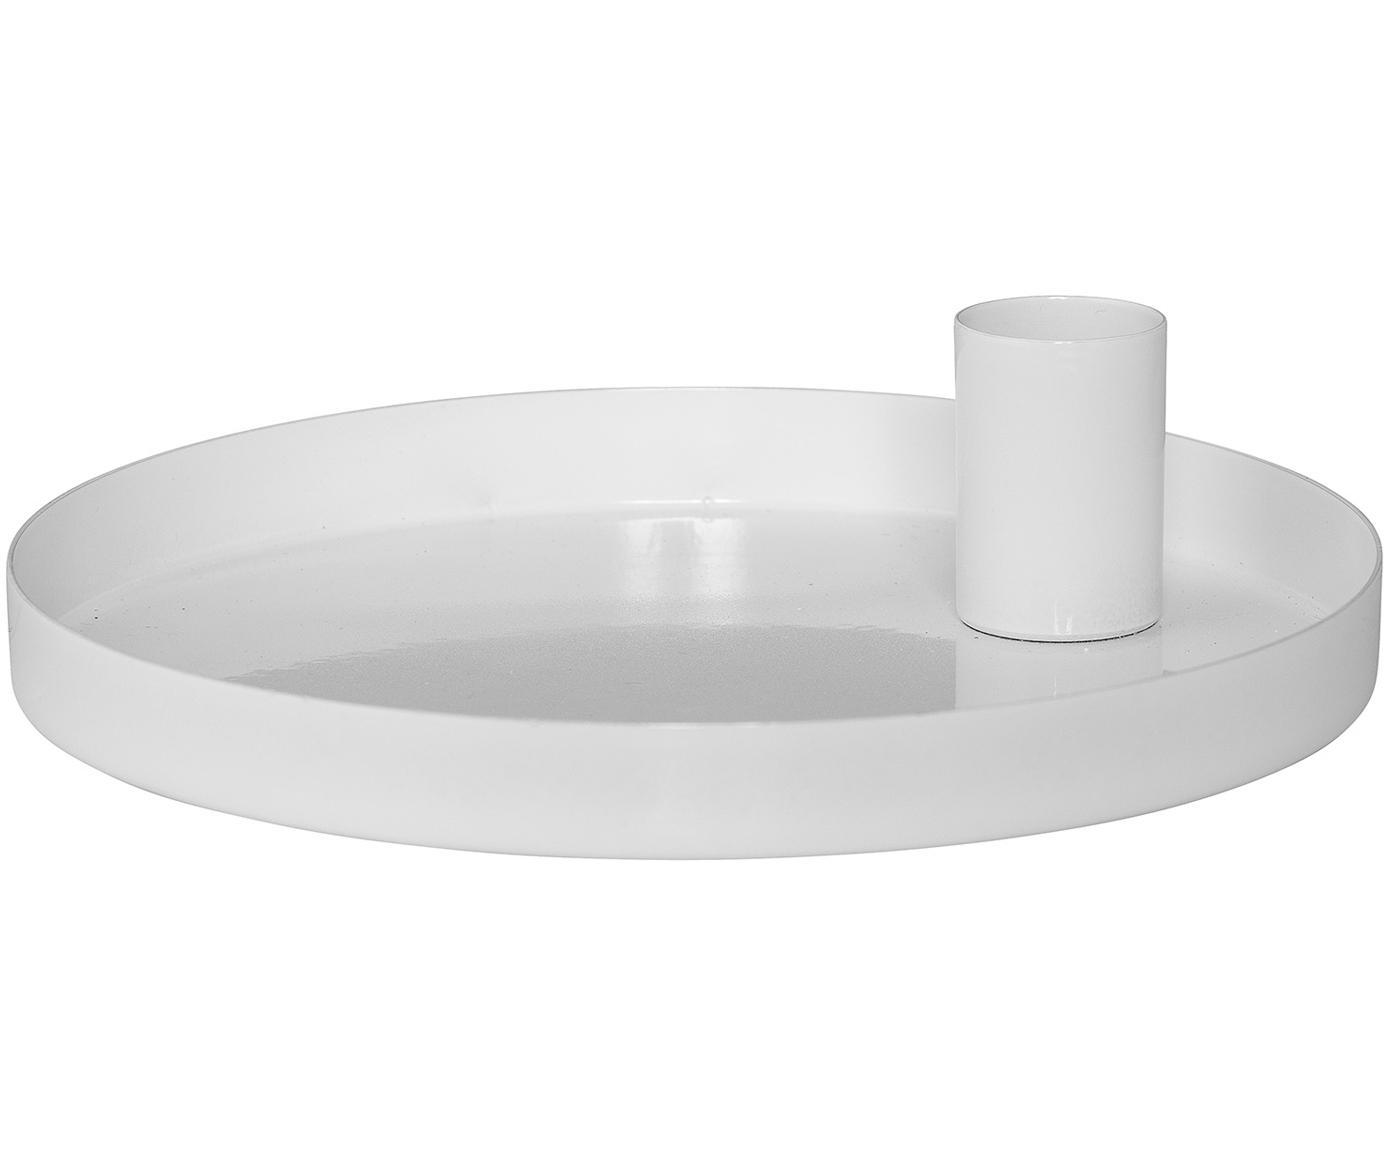 Candelabri Modern, Metallo rivestito, Bianco, Ø 15 x A 4 cm